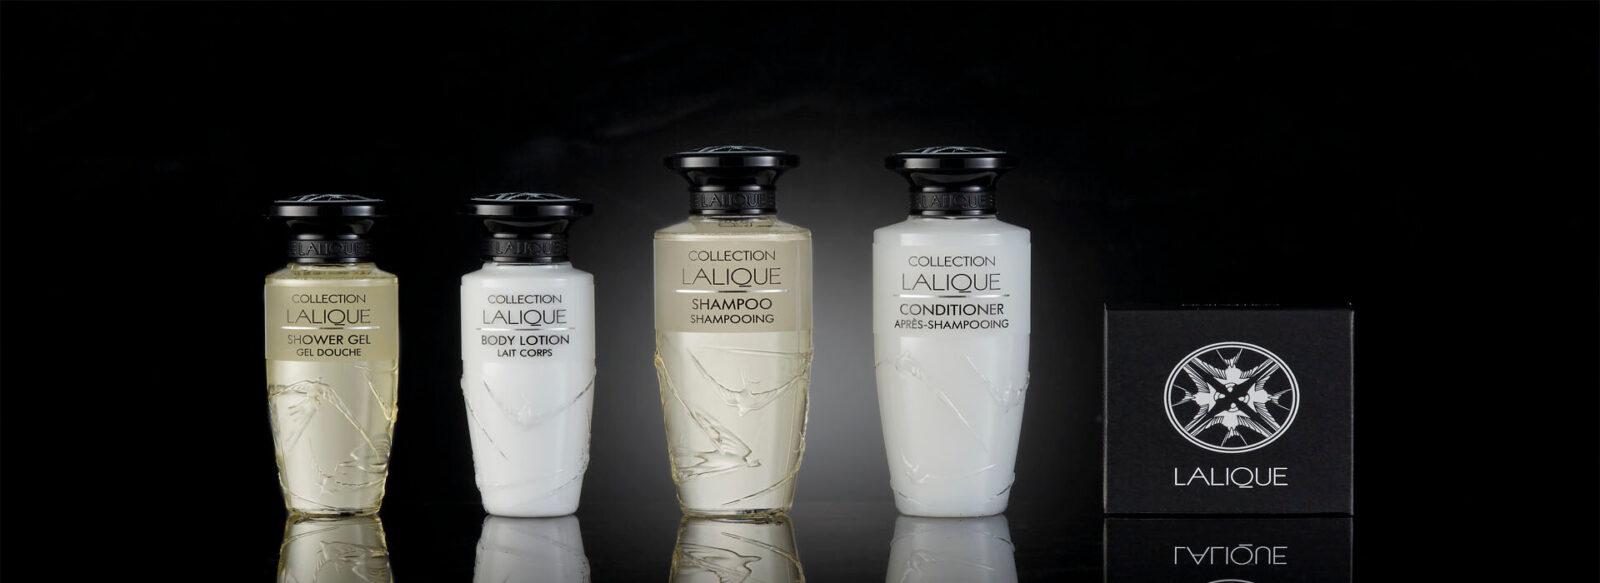 Косметика для гостиниц и отелей Lalique